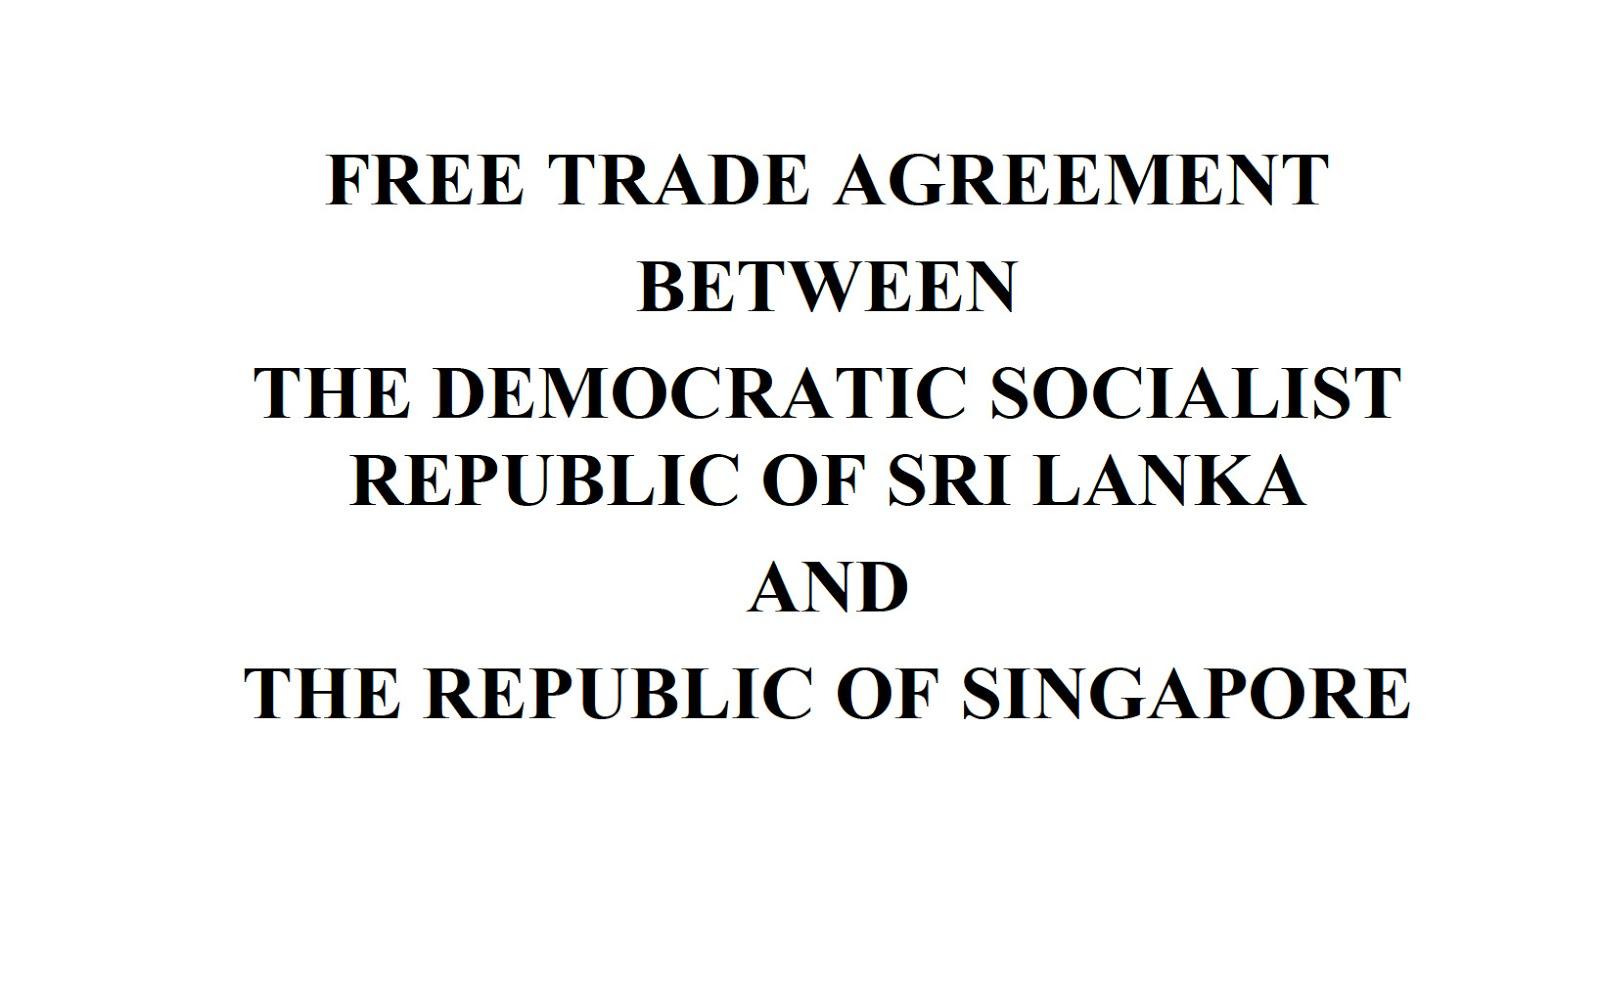 Hemantha Withanage: SINGAPORE- SRI LANKA FREE TRADE